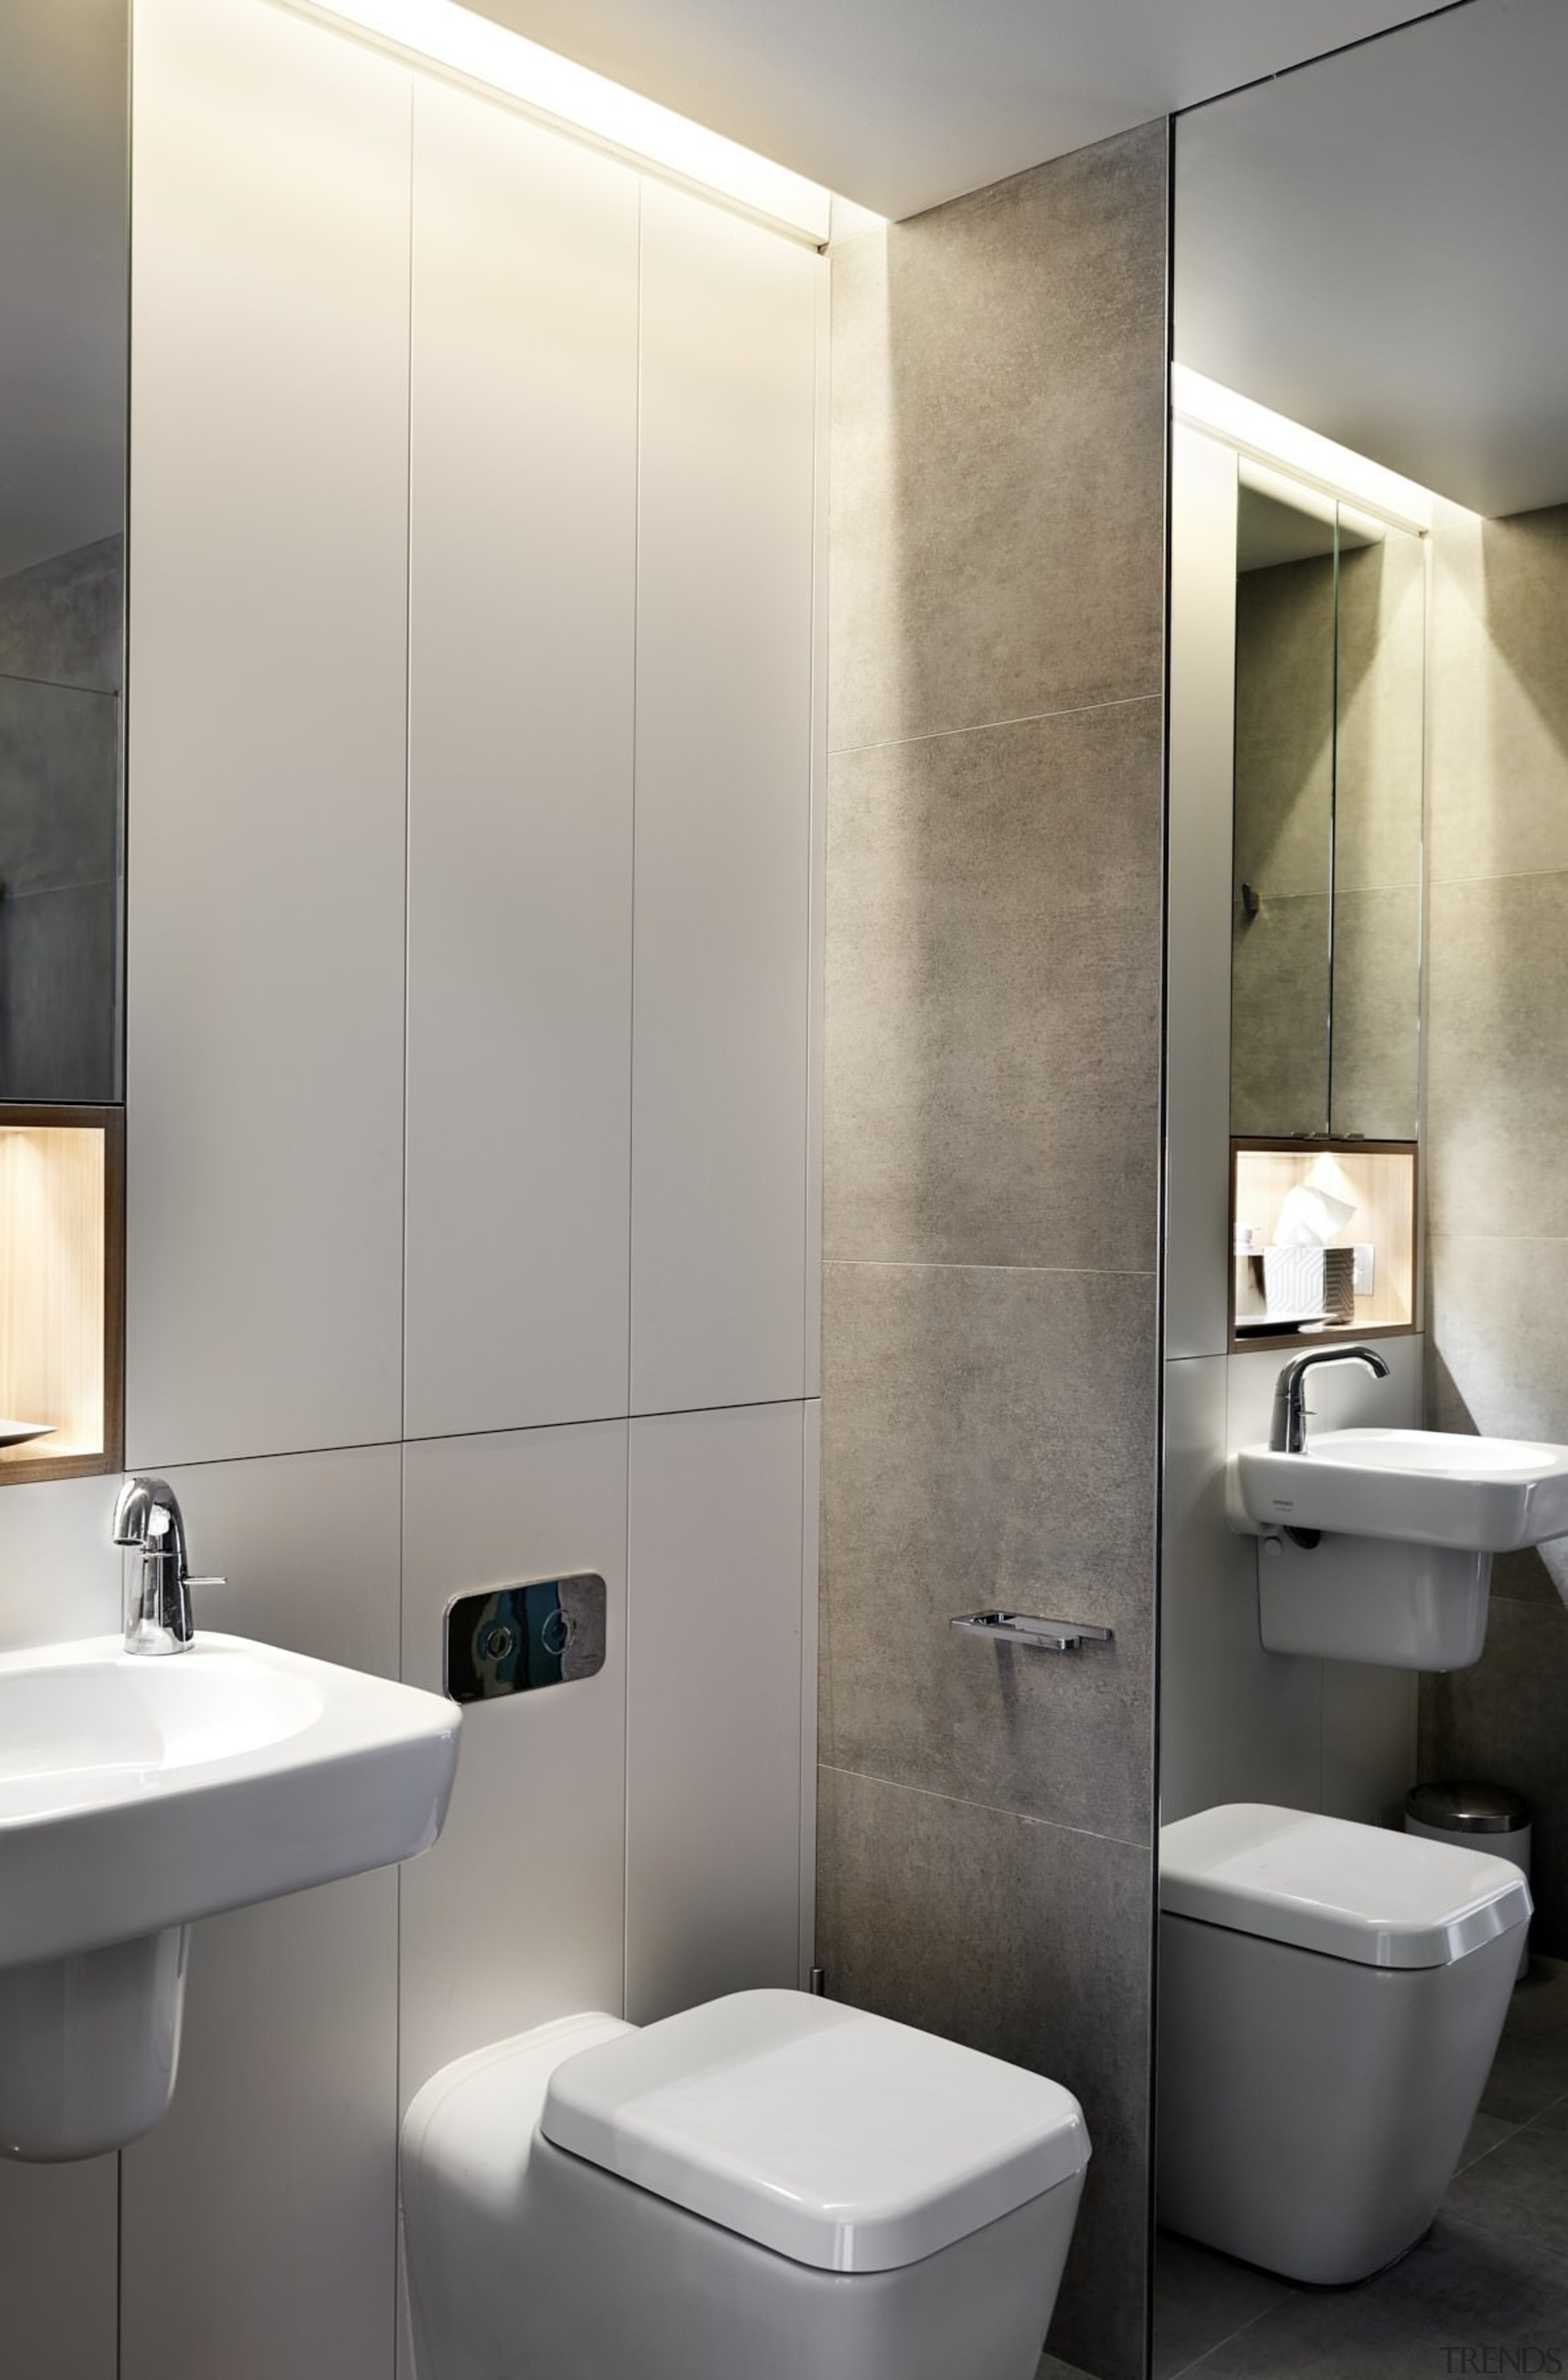 The bathroom features recessed lighting – like the bathroom, bathroom accessory, bathroom cabinet, bidet, floor, interior design, plumbing fixture, product design, sink, tap, toilet, toilet seat, wall, gray